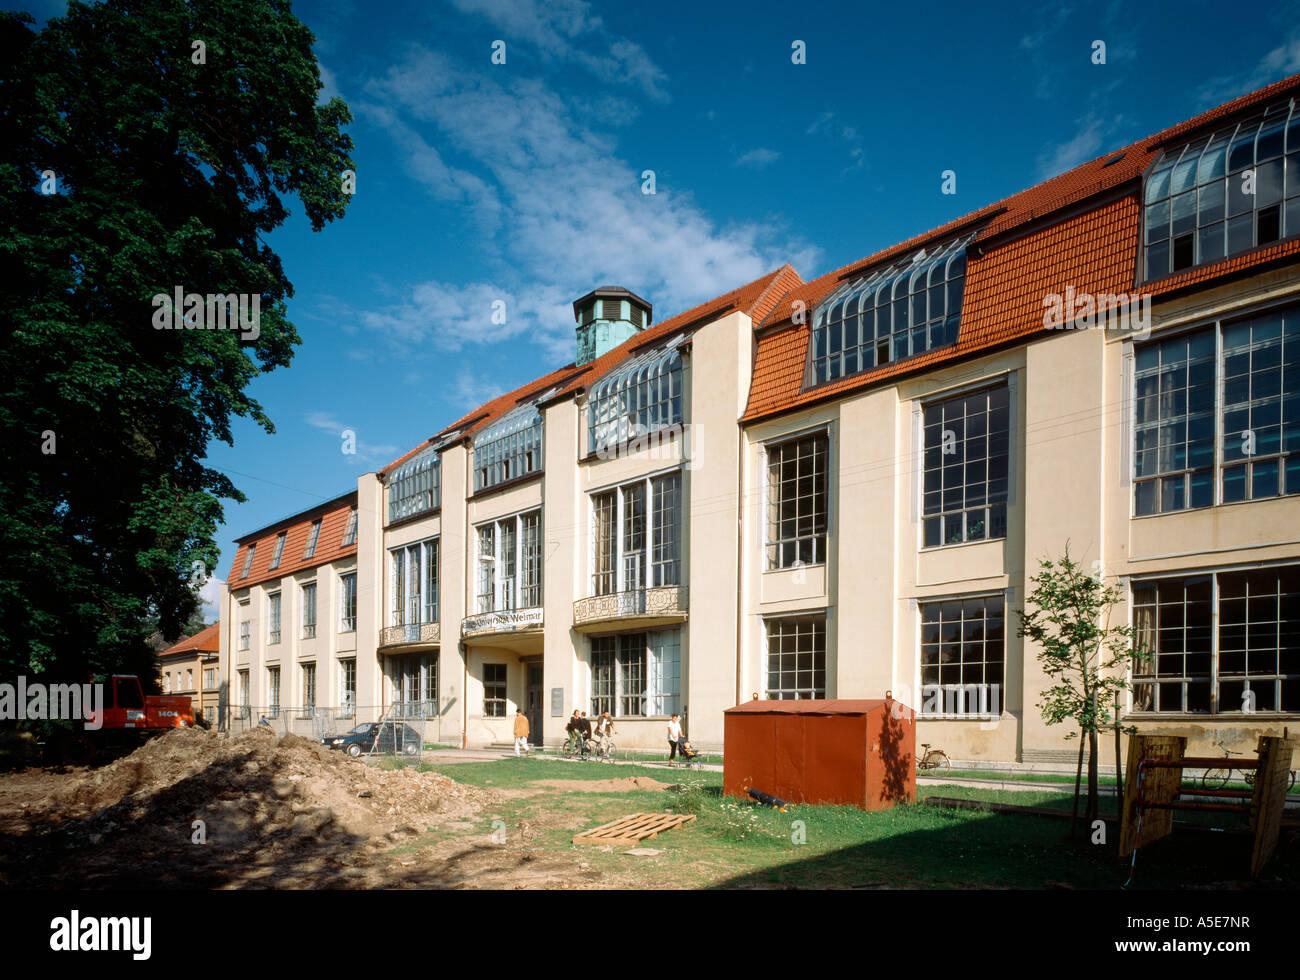 Free Awesome Amazing Weimar Ehemaliges Bauhaus With Frrd Bauhaus With  Bauhaus Karlsruhe With Bauhaus Dren With Bauhaus Pantrykche